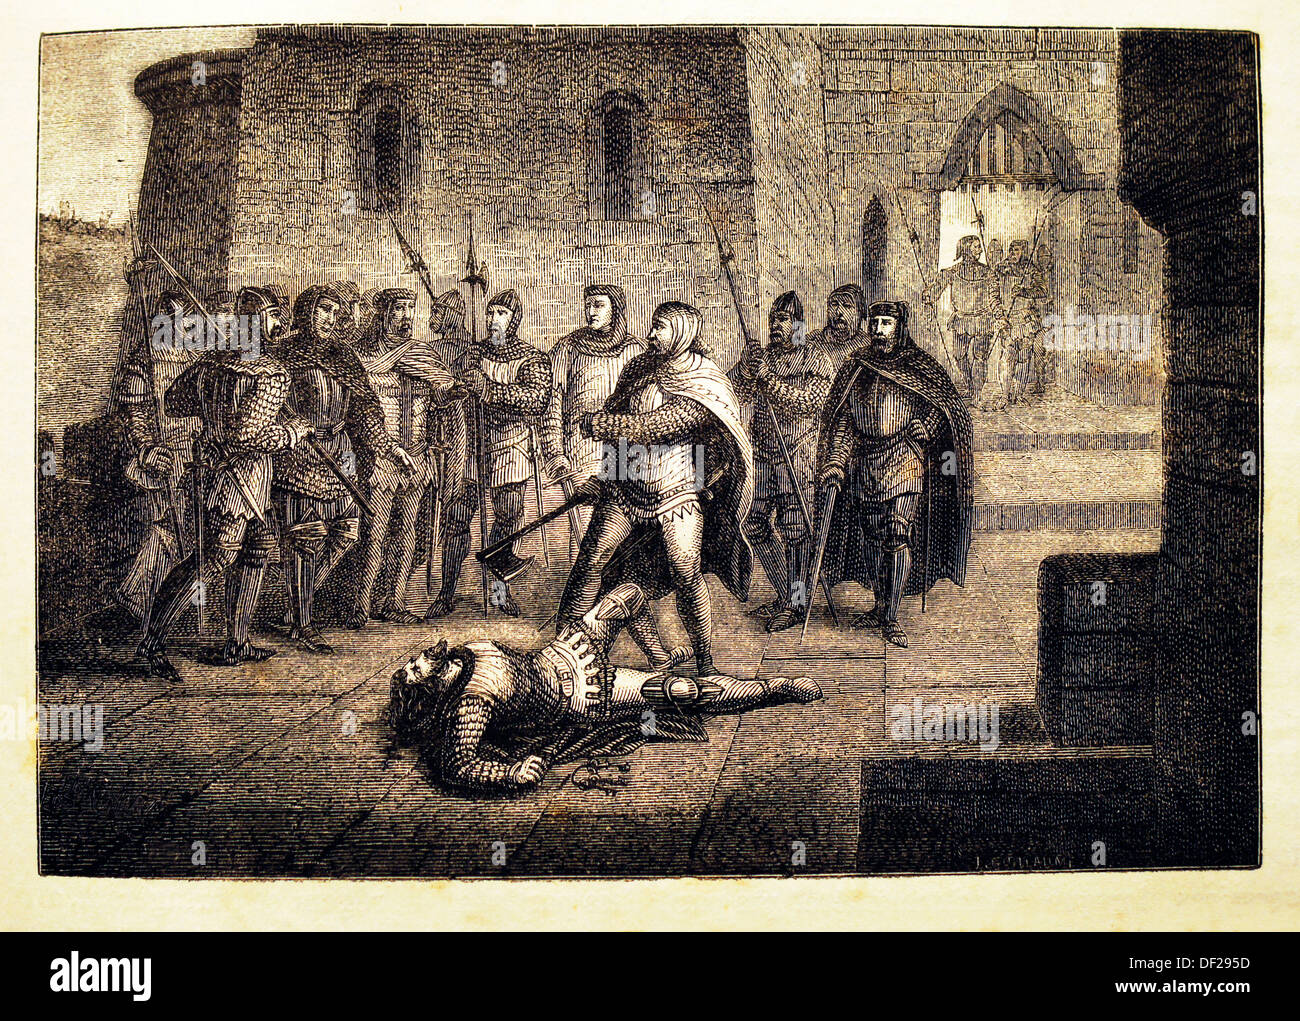 france history 14th century mort d etienne marcel Étienne